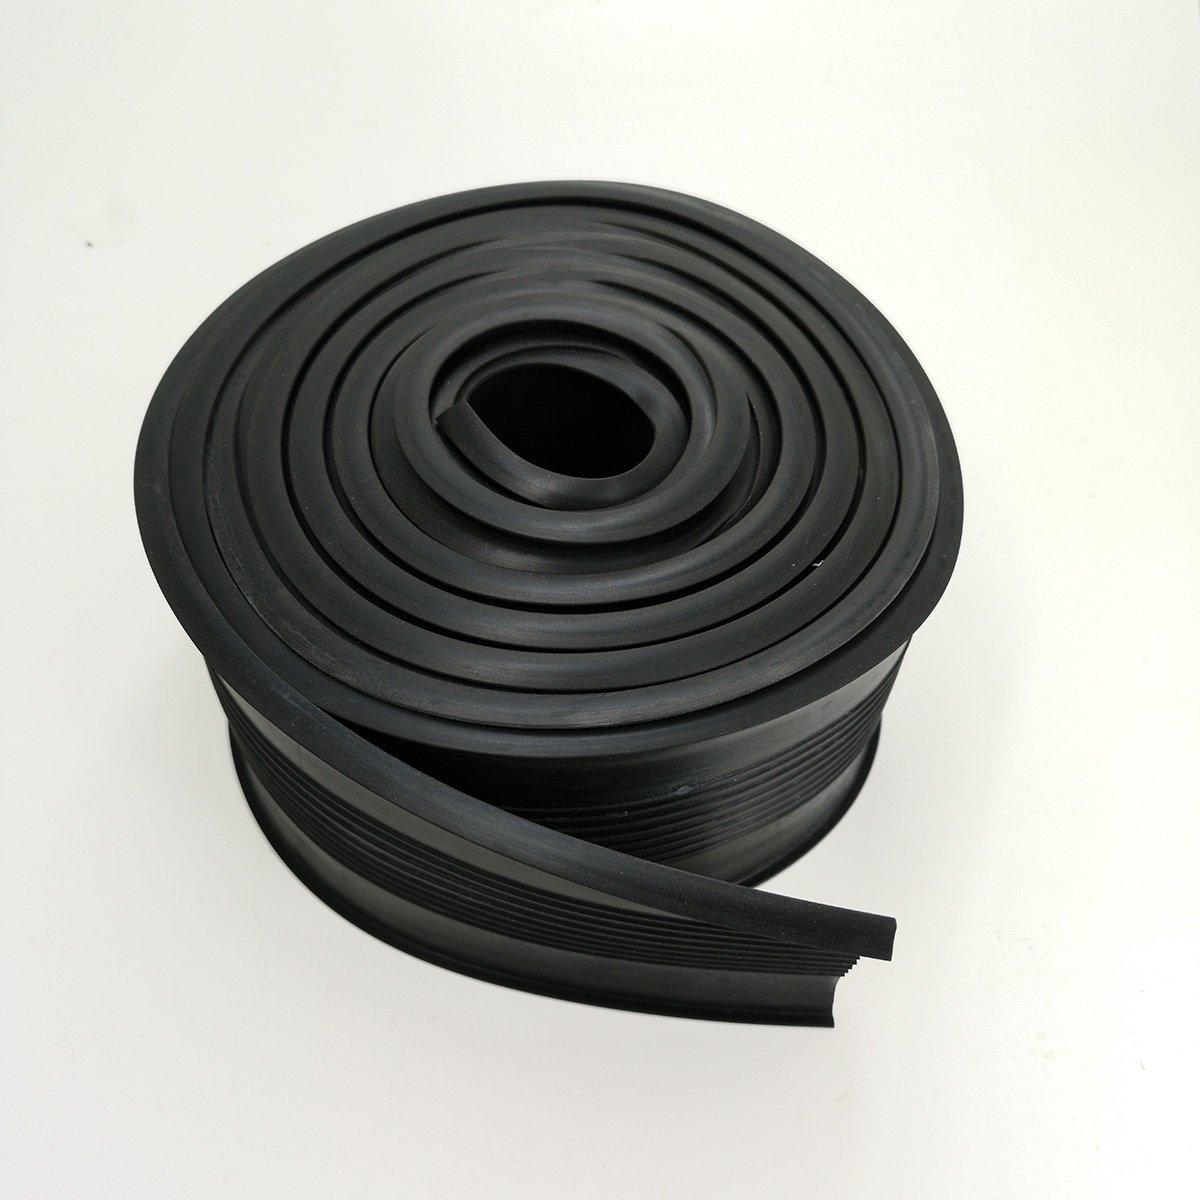 BOWSEN Garage Door Seal U Shape Gasket Bottom Rubber Weather Stripping Black U Shape, 5/16inch T-end, 12FT Long